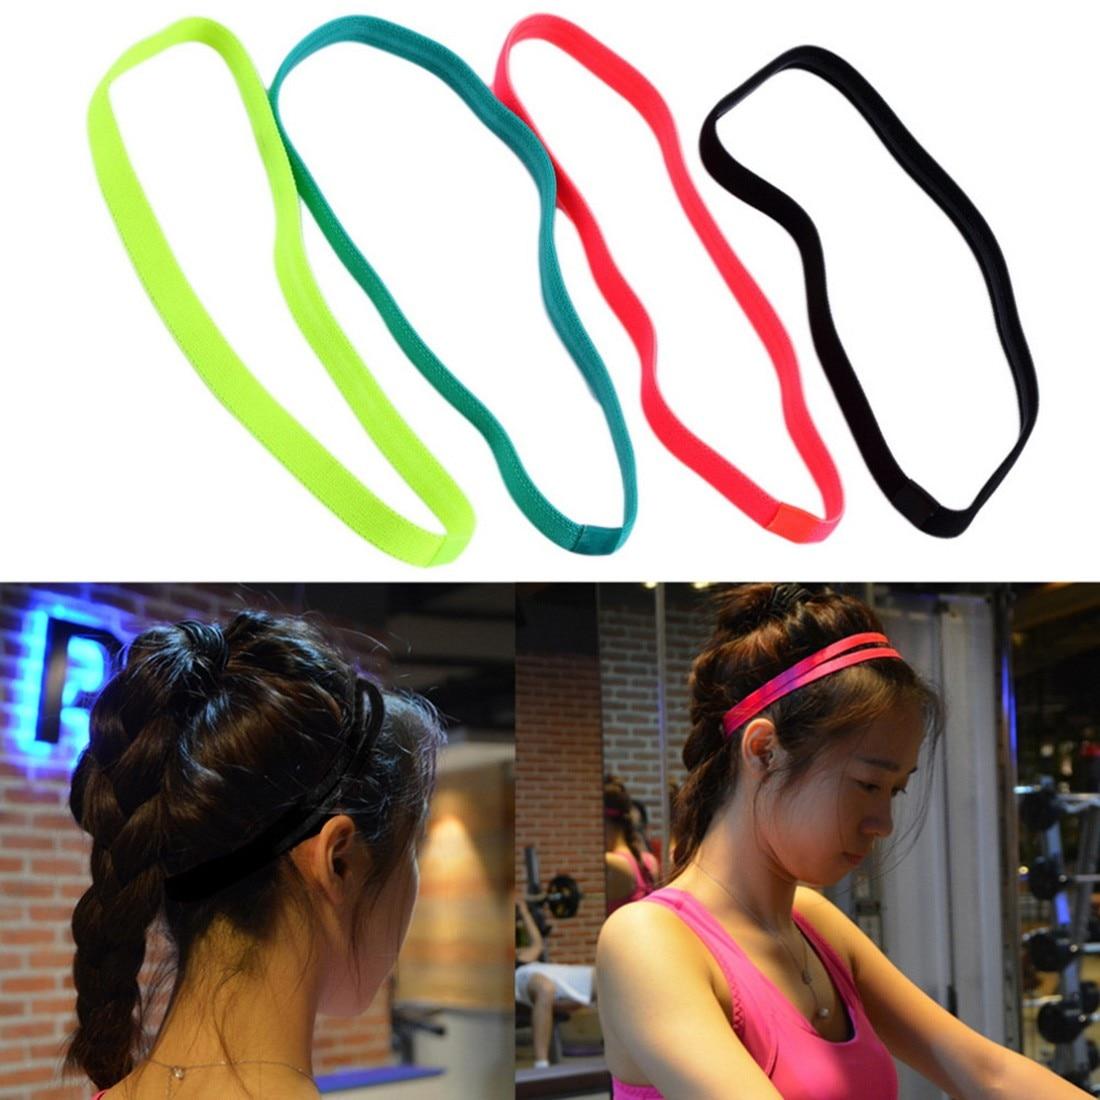 Women Men Yoga Headband SportHairband Anti-slip Elastic Rubber Sweatband Football Yoga Running Band Yoga Accessories